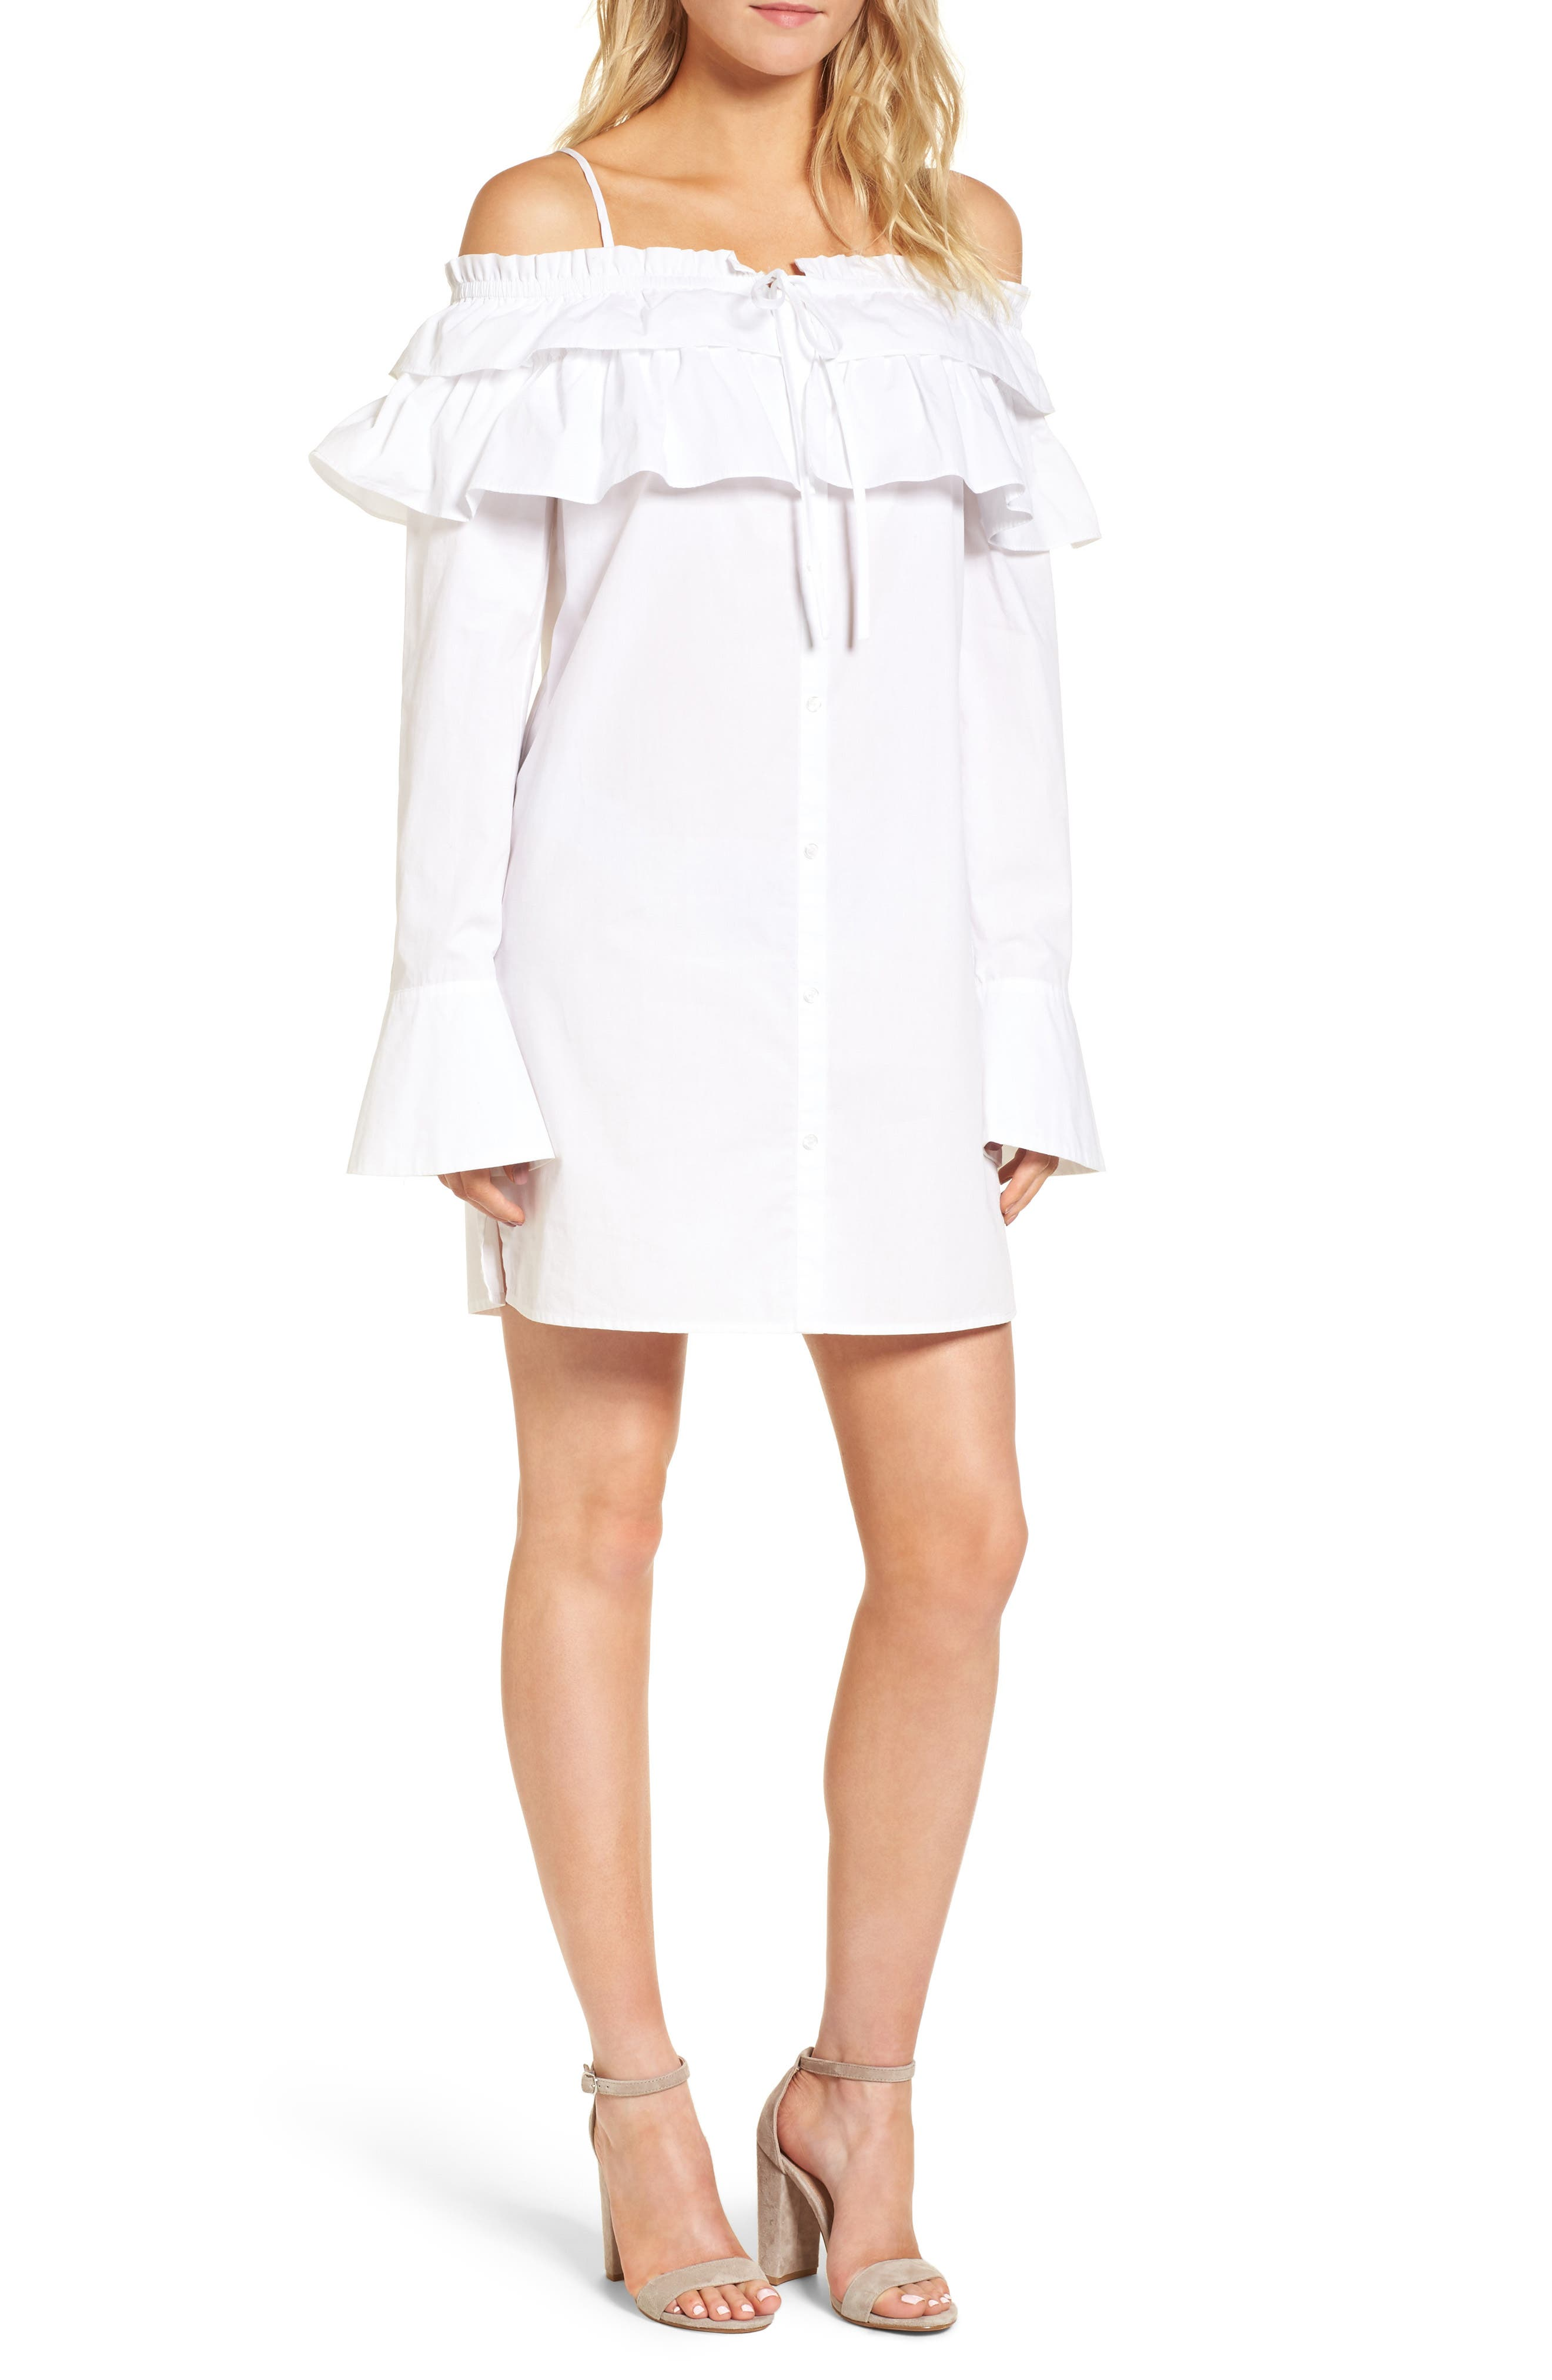 Main Image - Rebecca Minkoff Pallas Off the Shoulder Dress